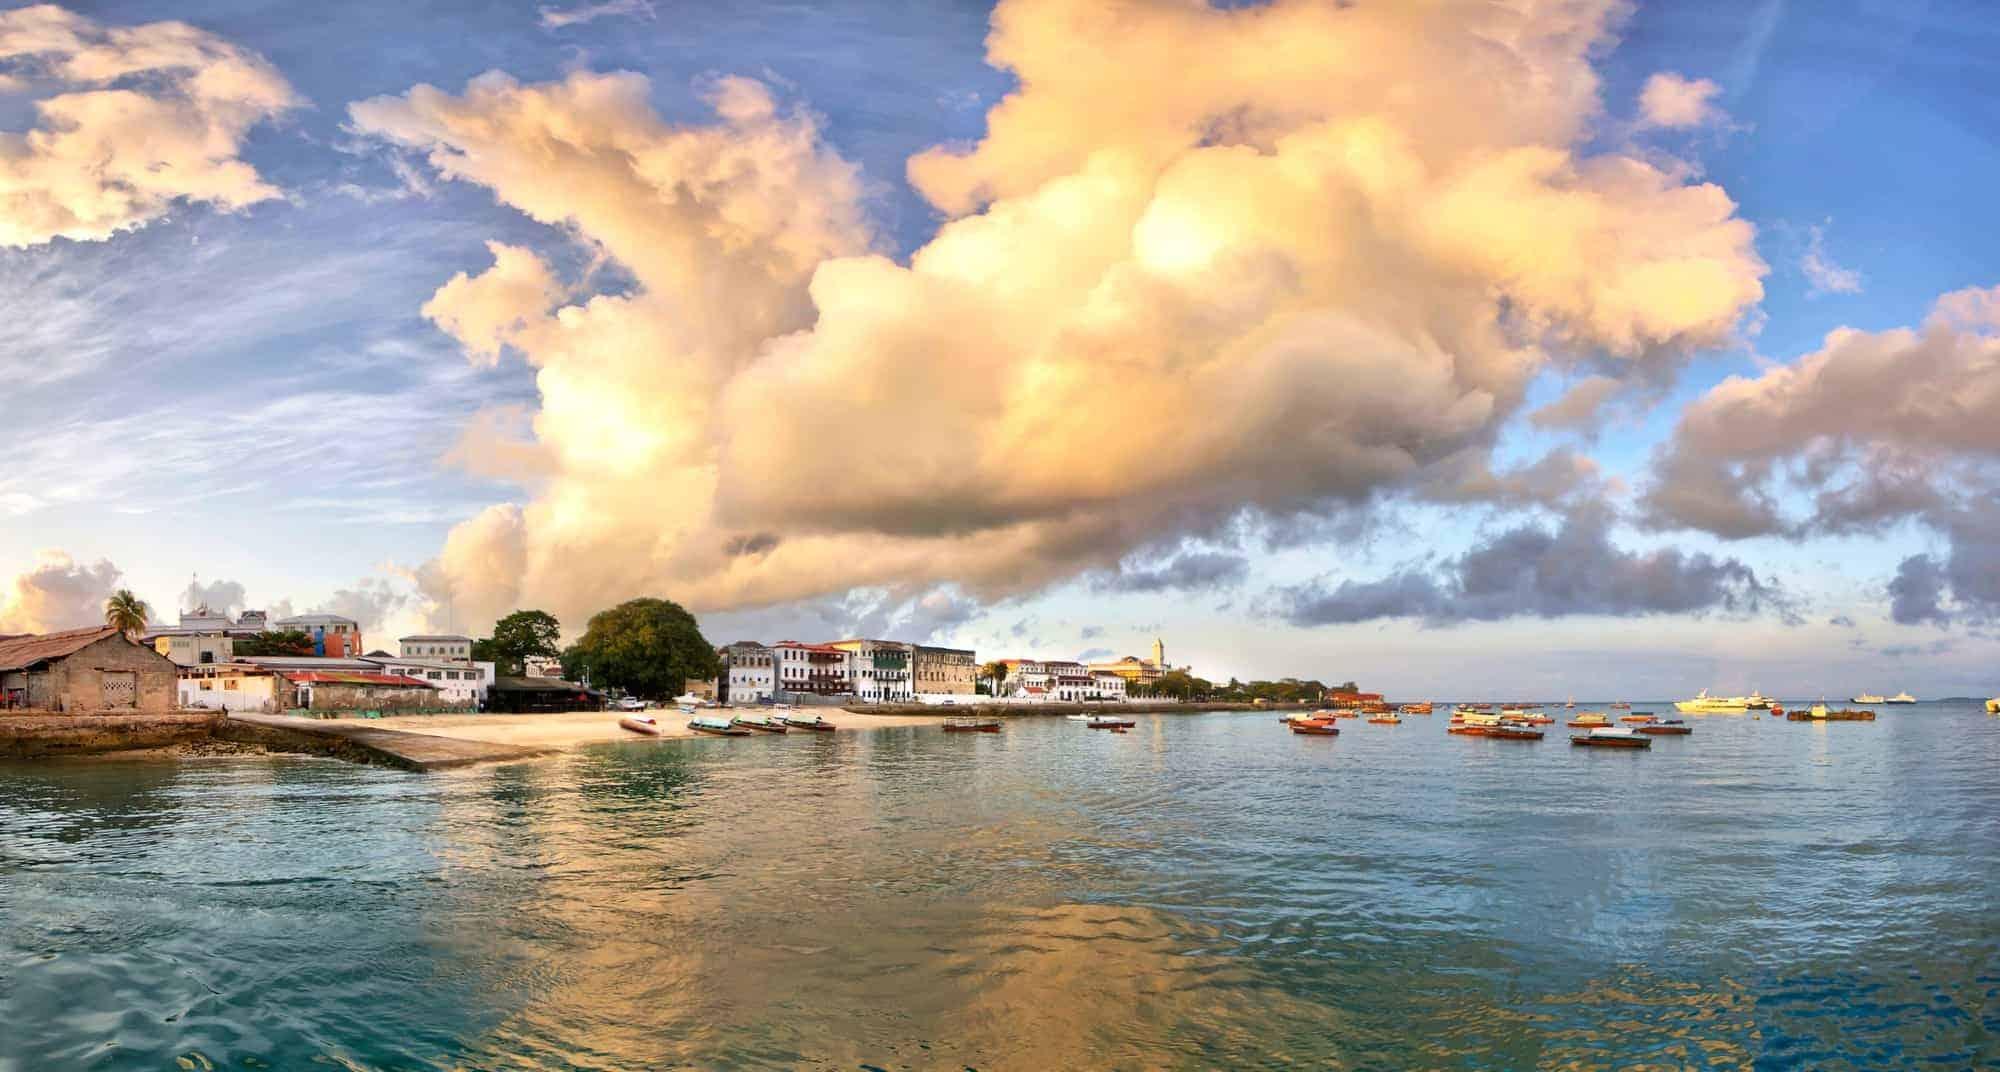 Panorama of Stone Town on Zanzibar island in Tanzania during sunrise with dramatic clouds.